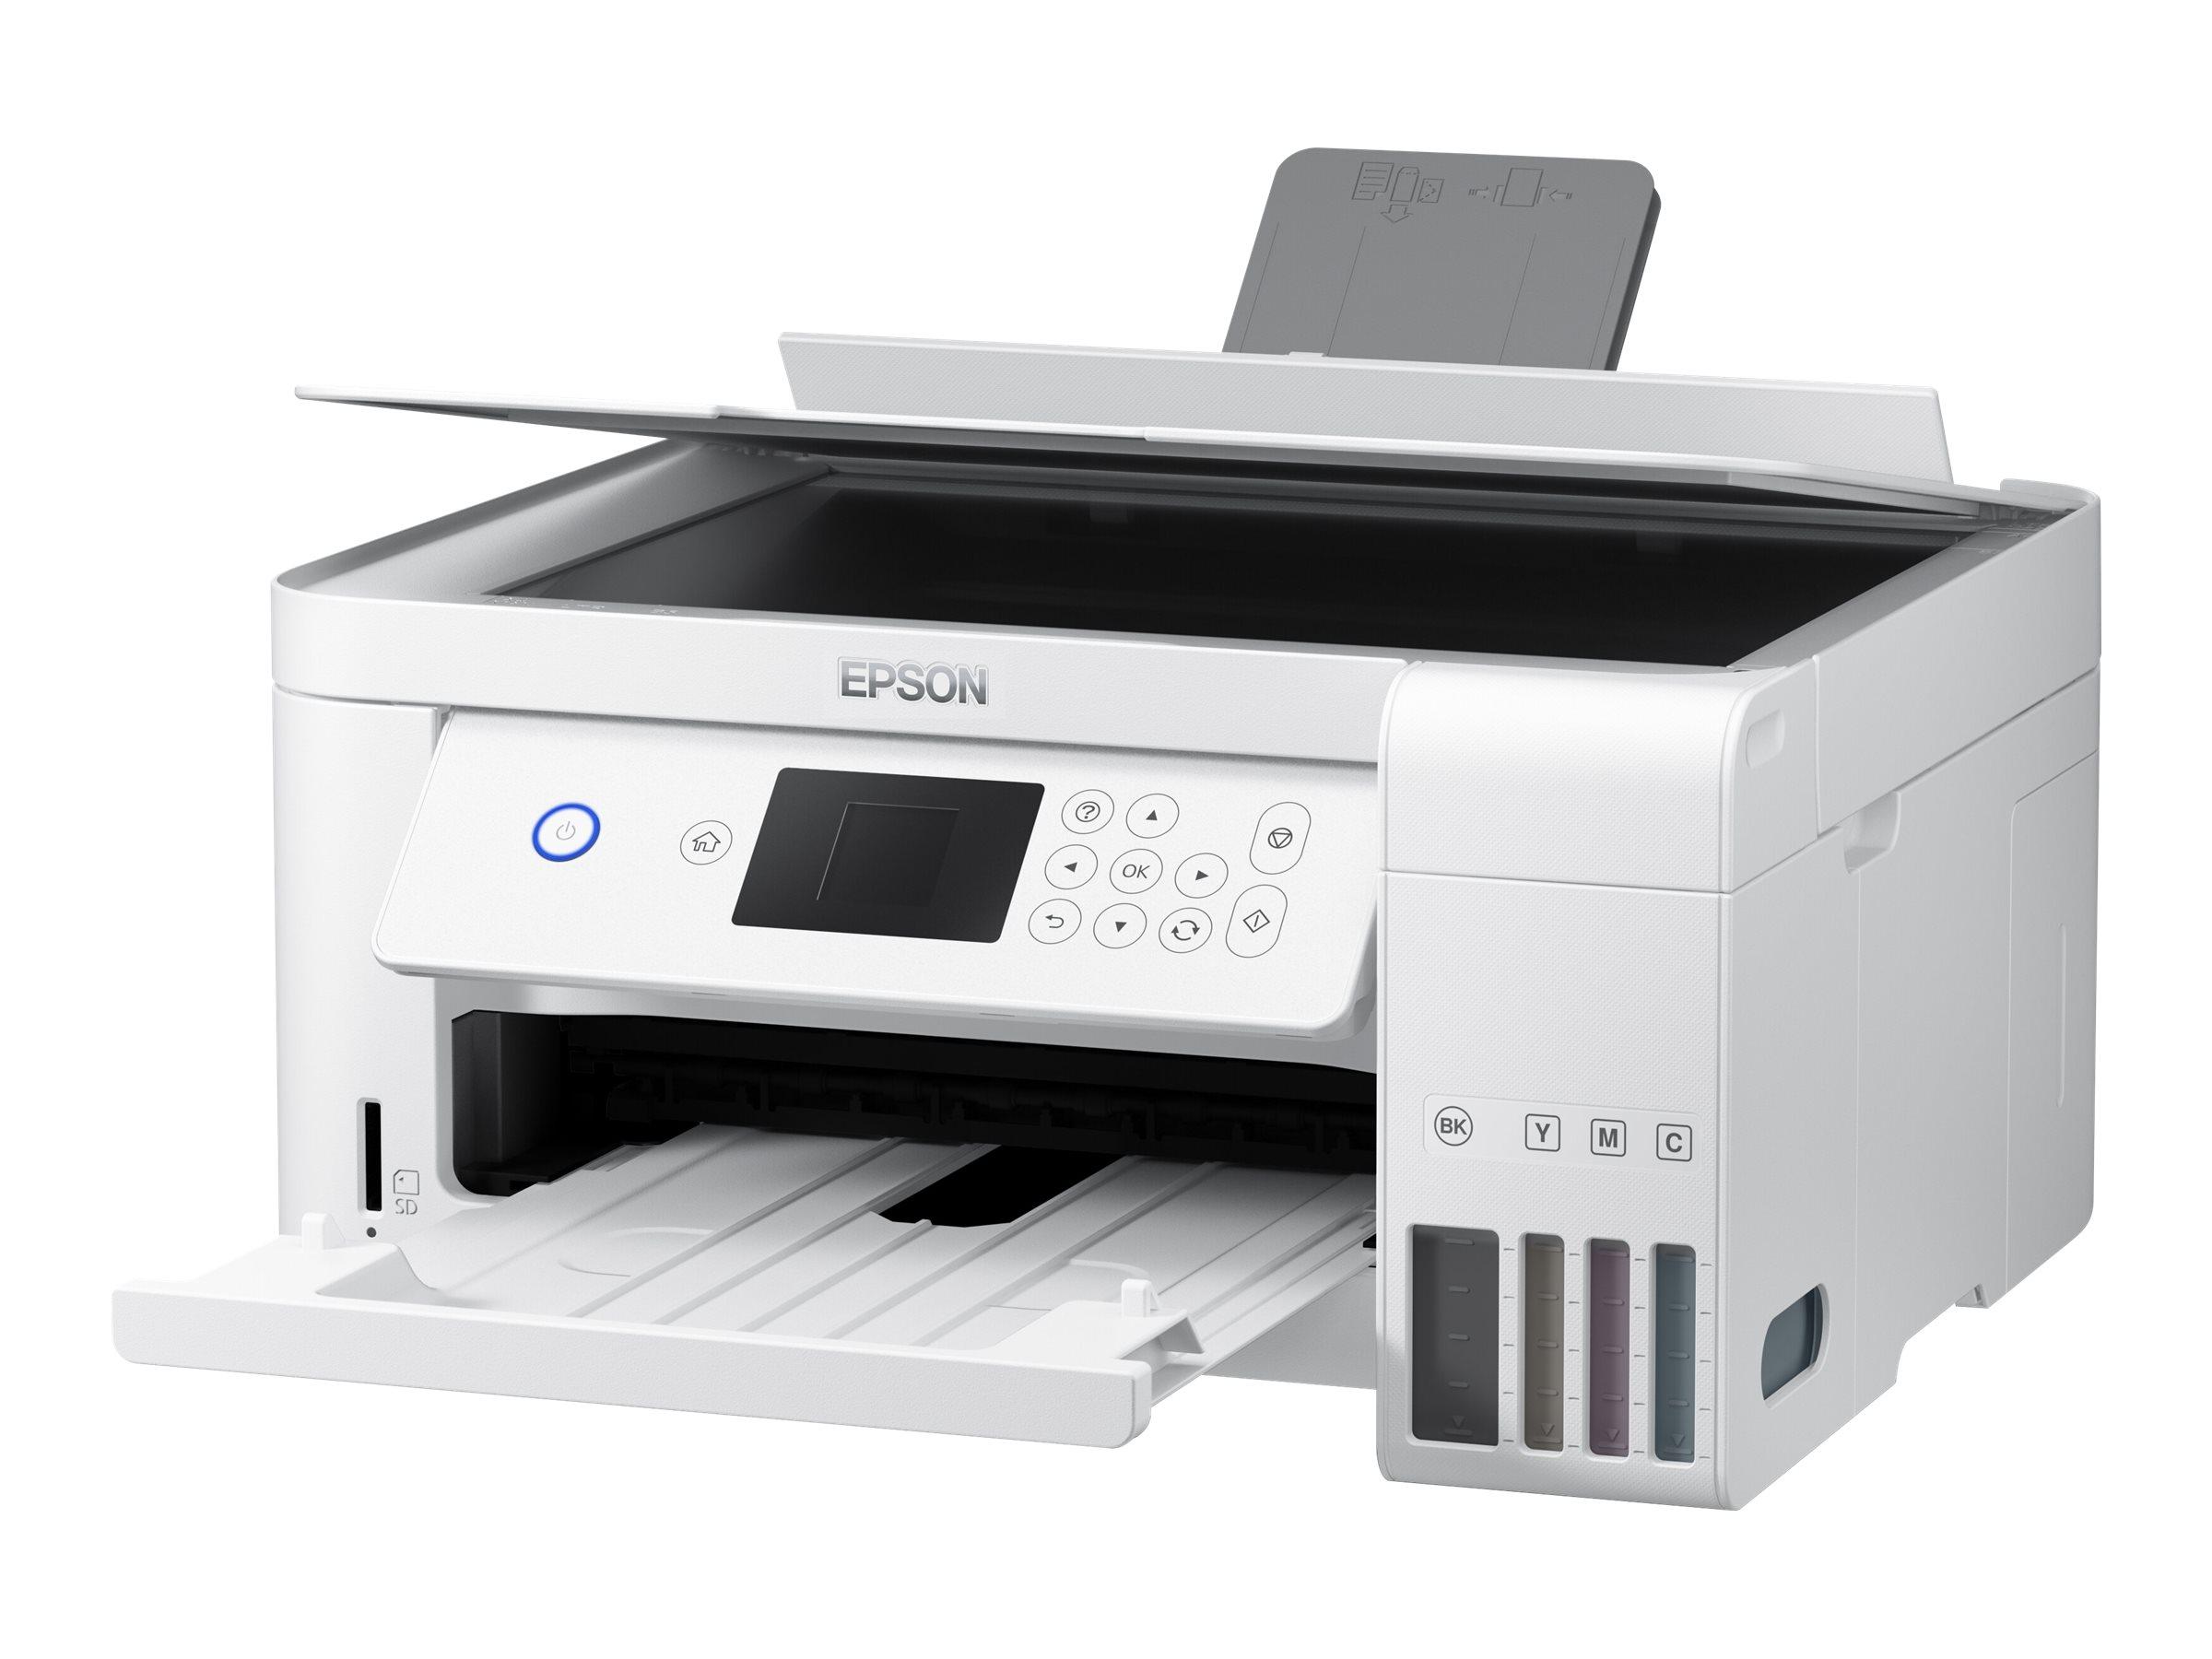 Epson EcoTank ET-2756 - Multifunktionsdrucker - Farbe - Tintenstrahl - refillable - A4/Legal (Medien)